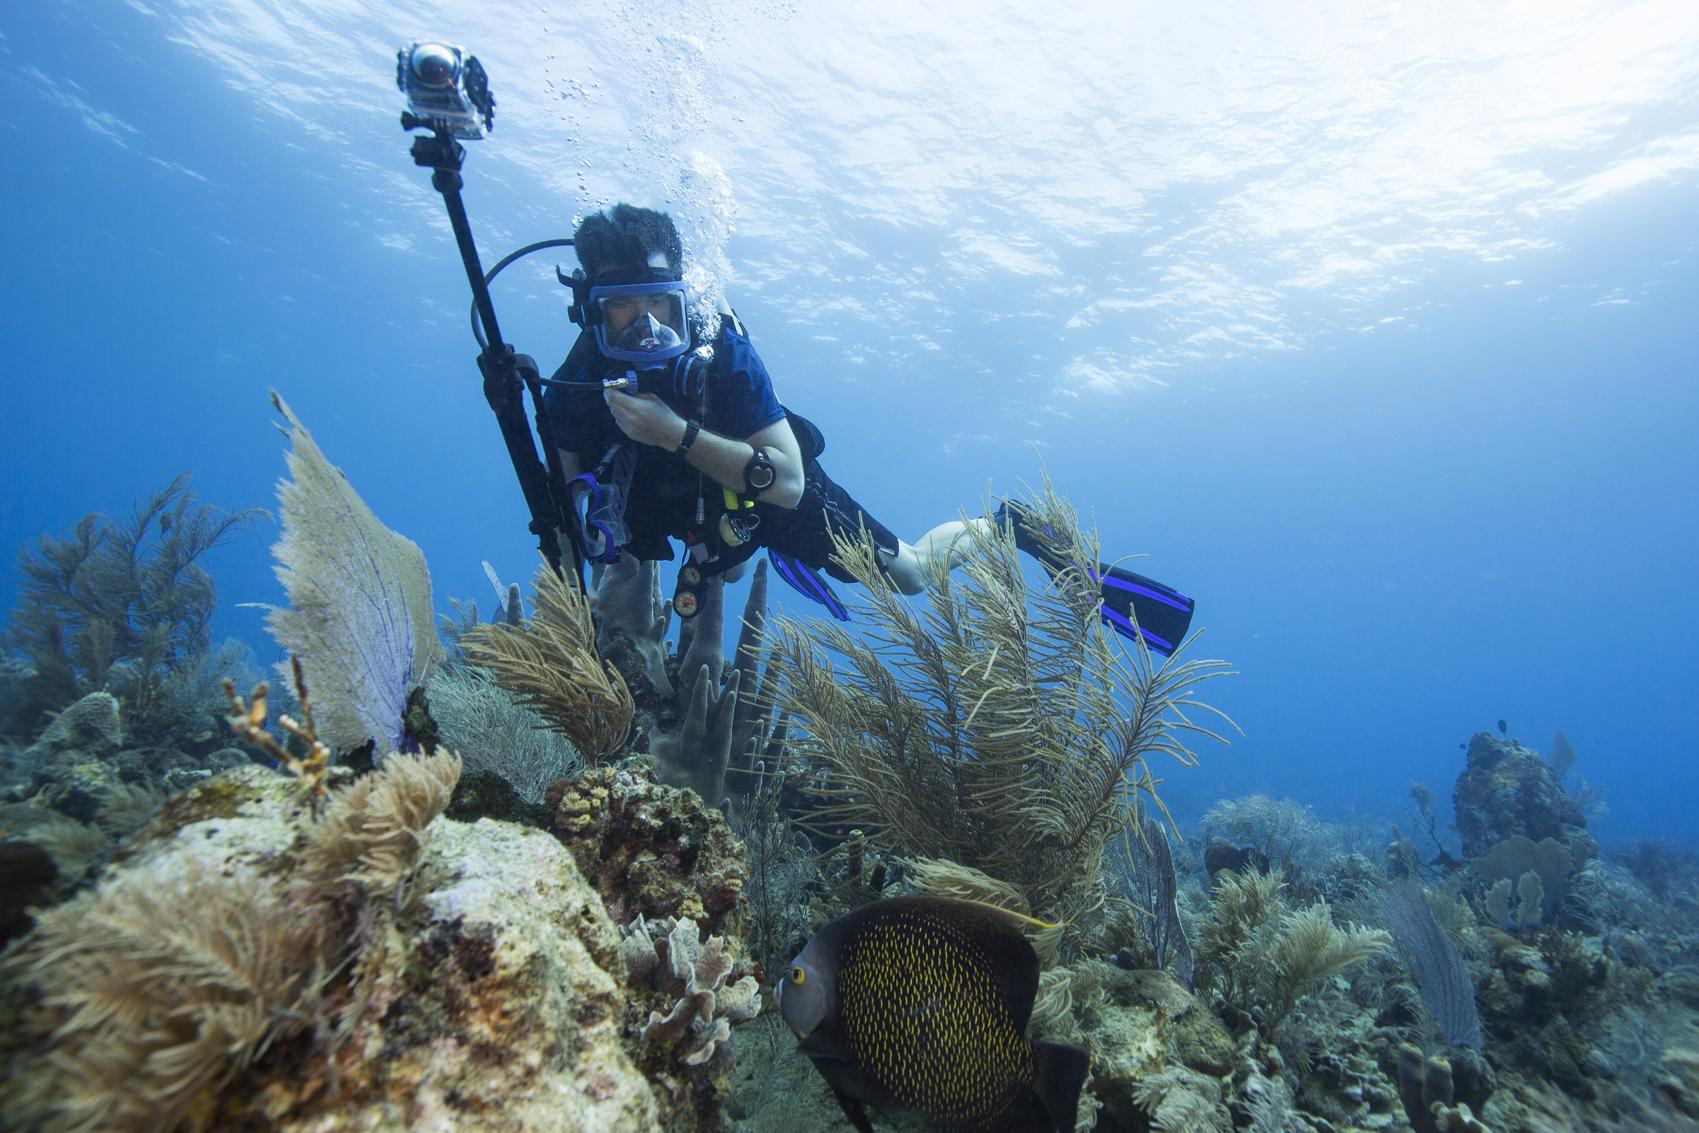 Justin Grubb uses Kodak PixPro's 360 camera to film french angelfish off the coast of Utila.